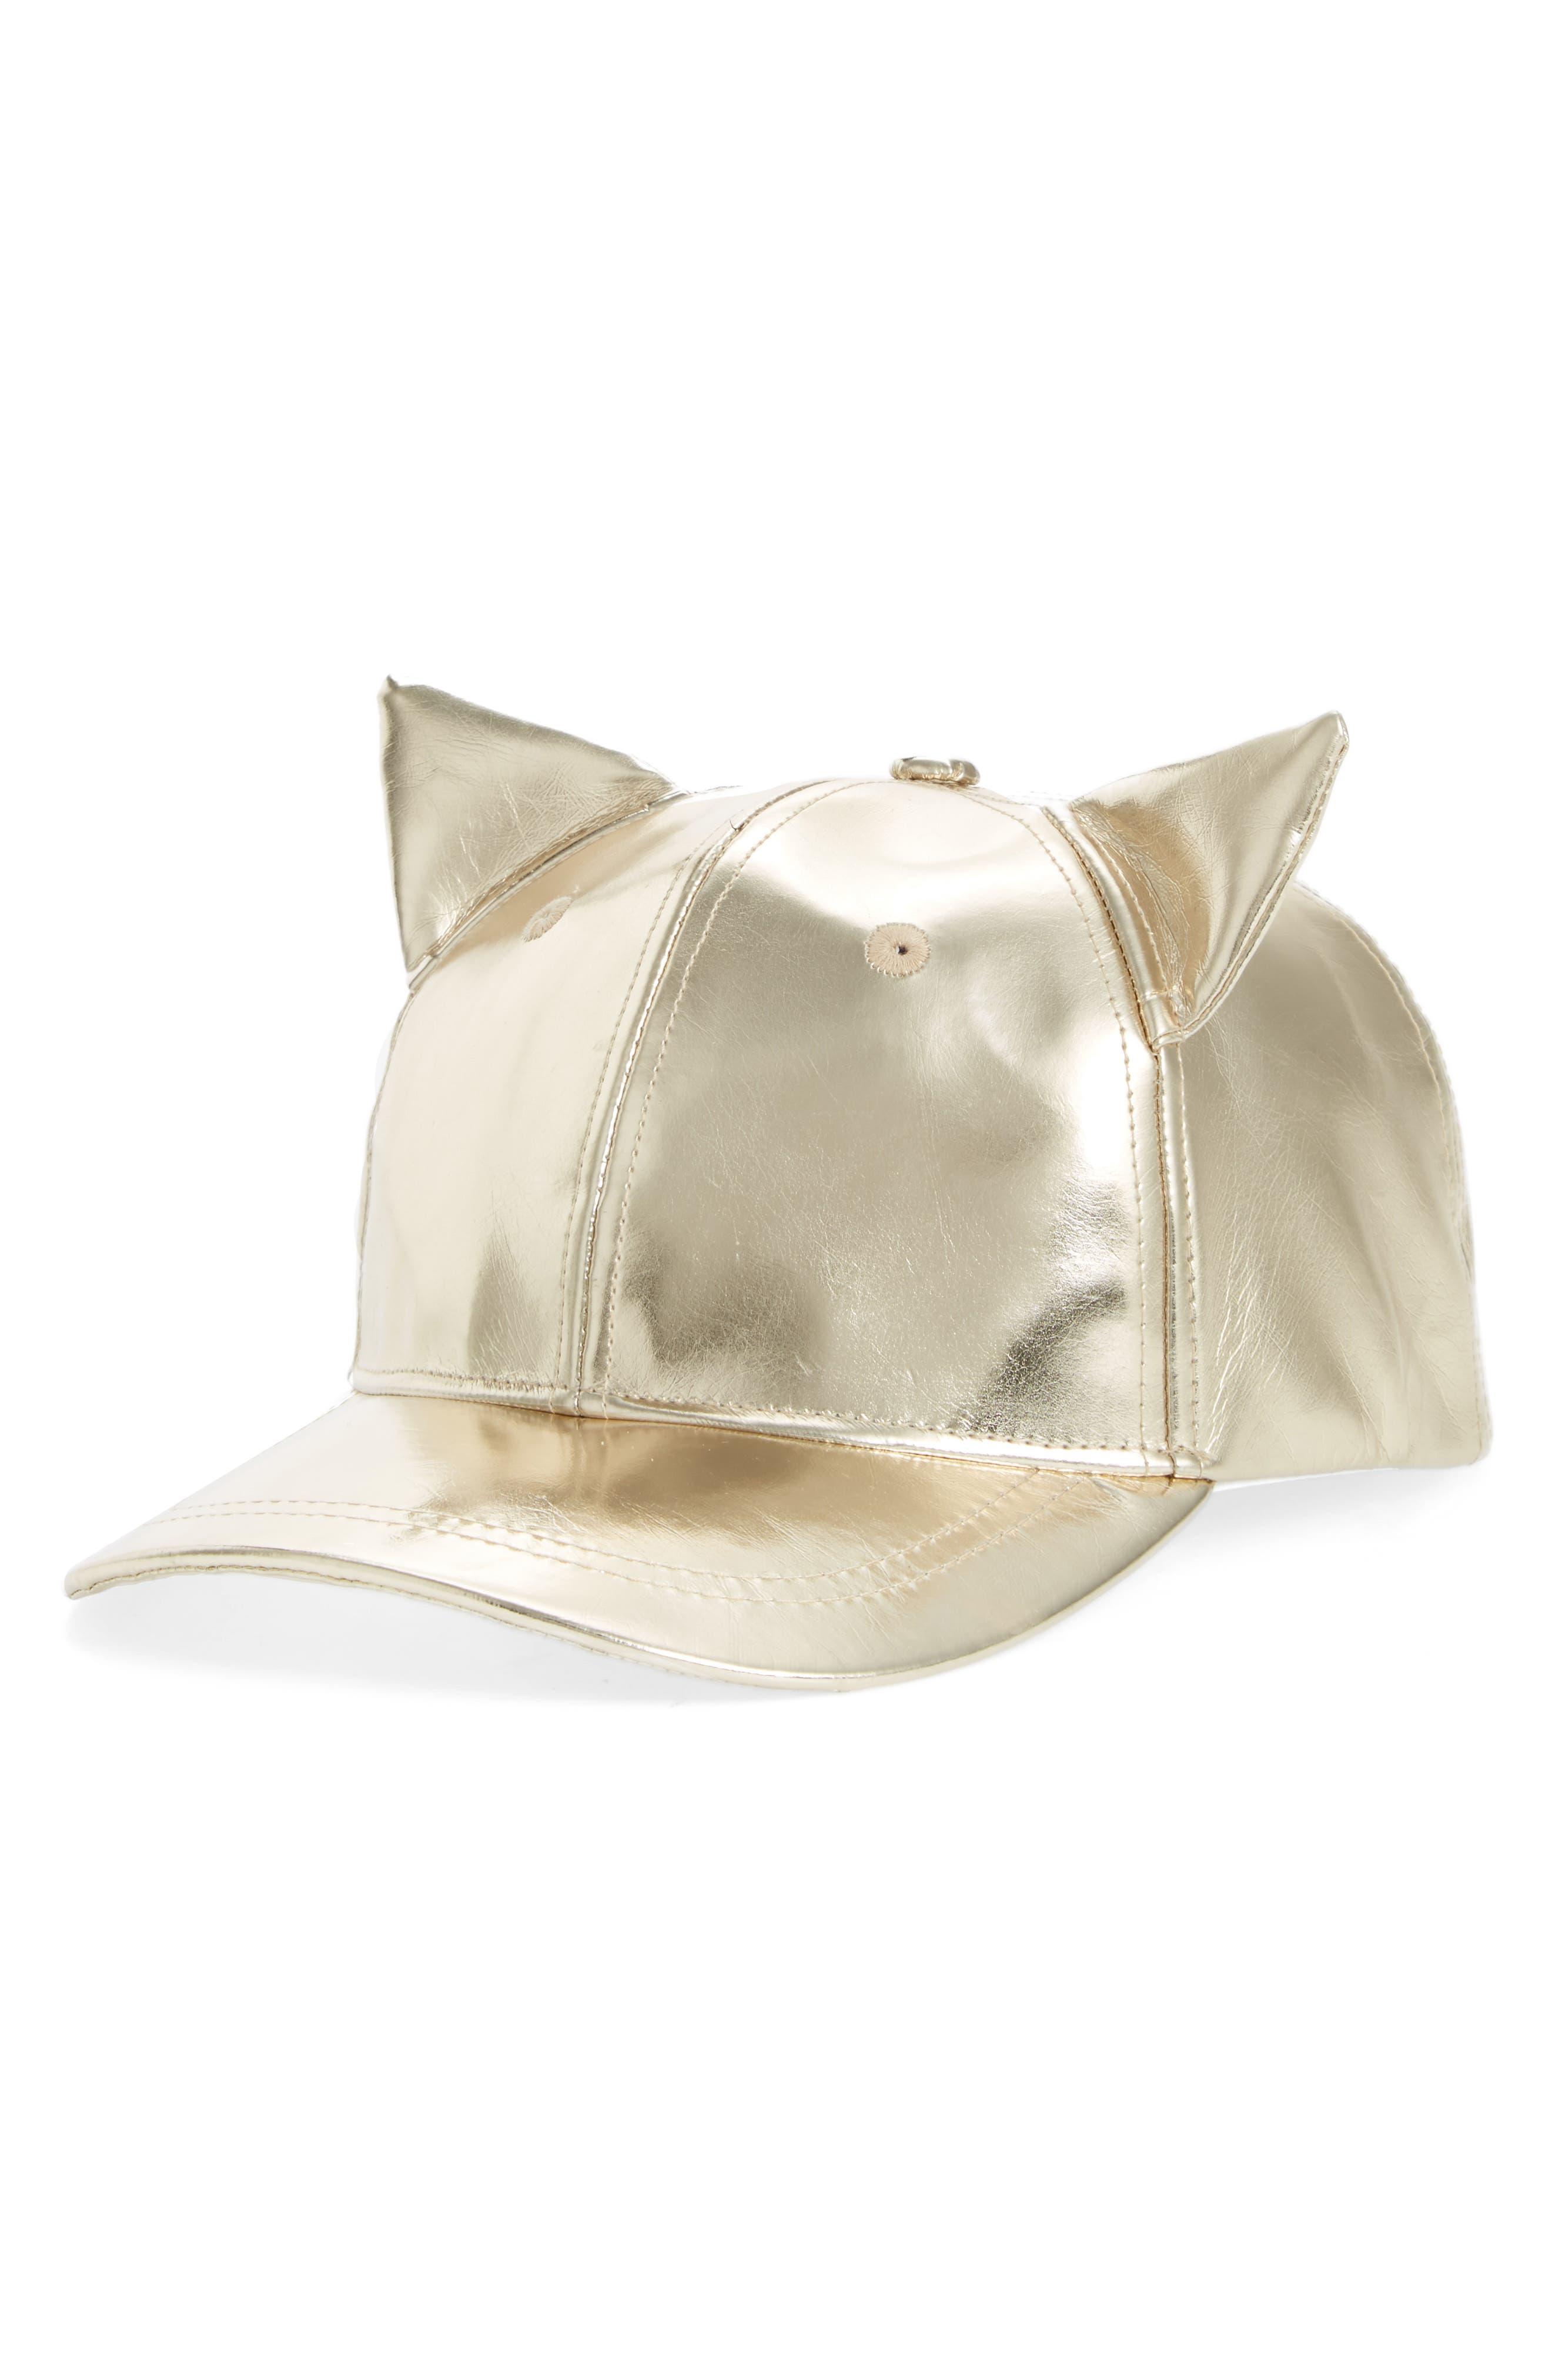 Alternate Image 1 Selected - Tucker + Tate Cat Ears Baseball Cap (Big Girls)